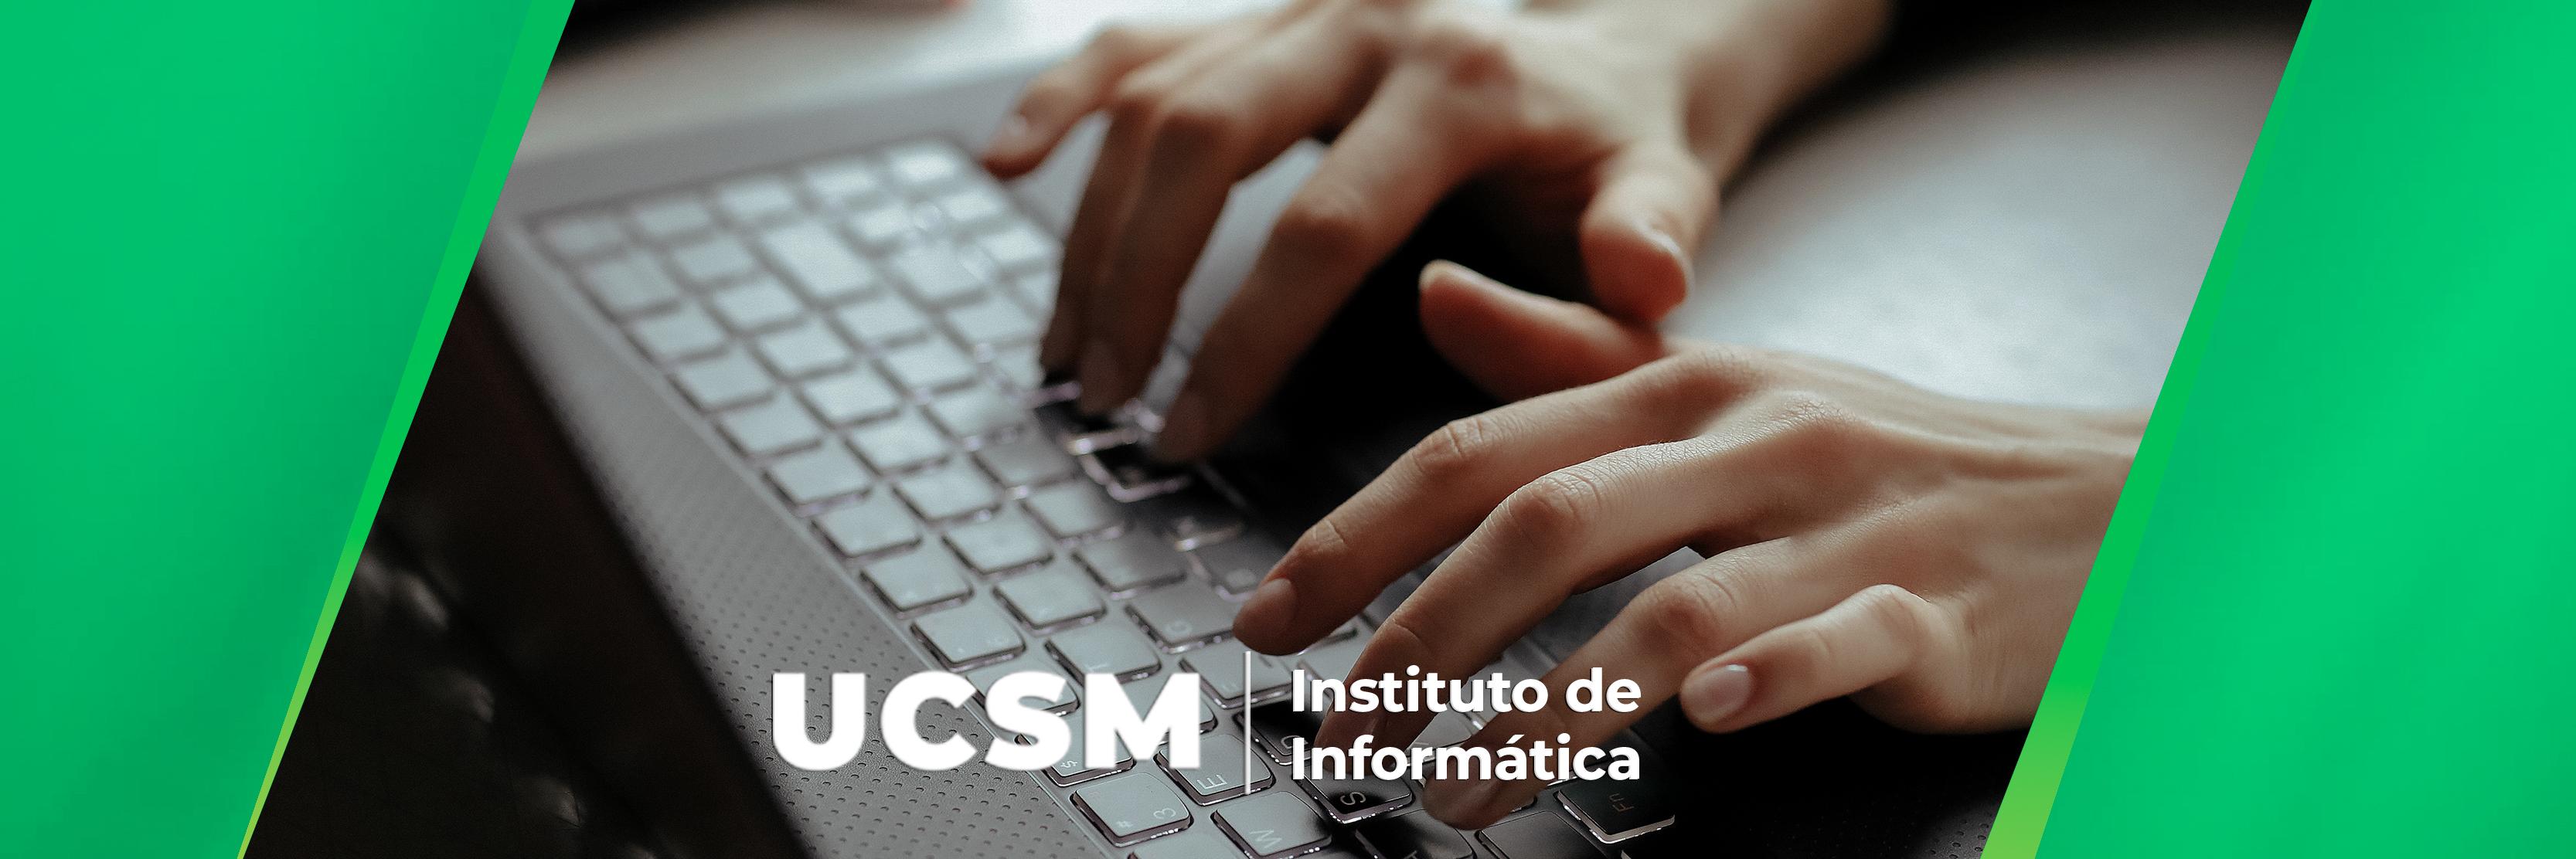 instituto-de-informatica